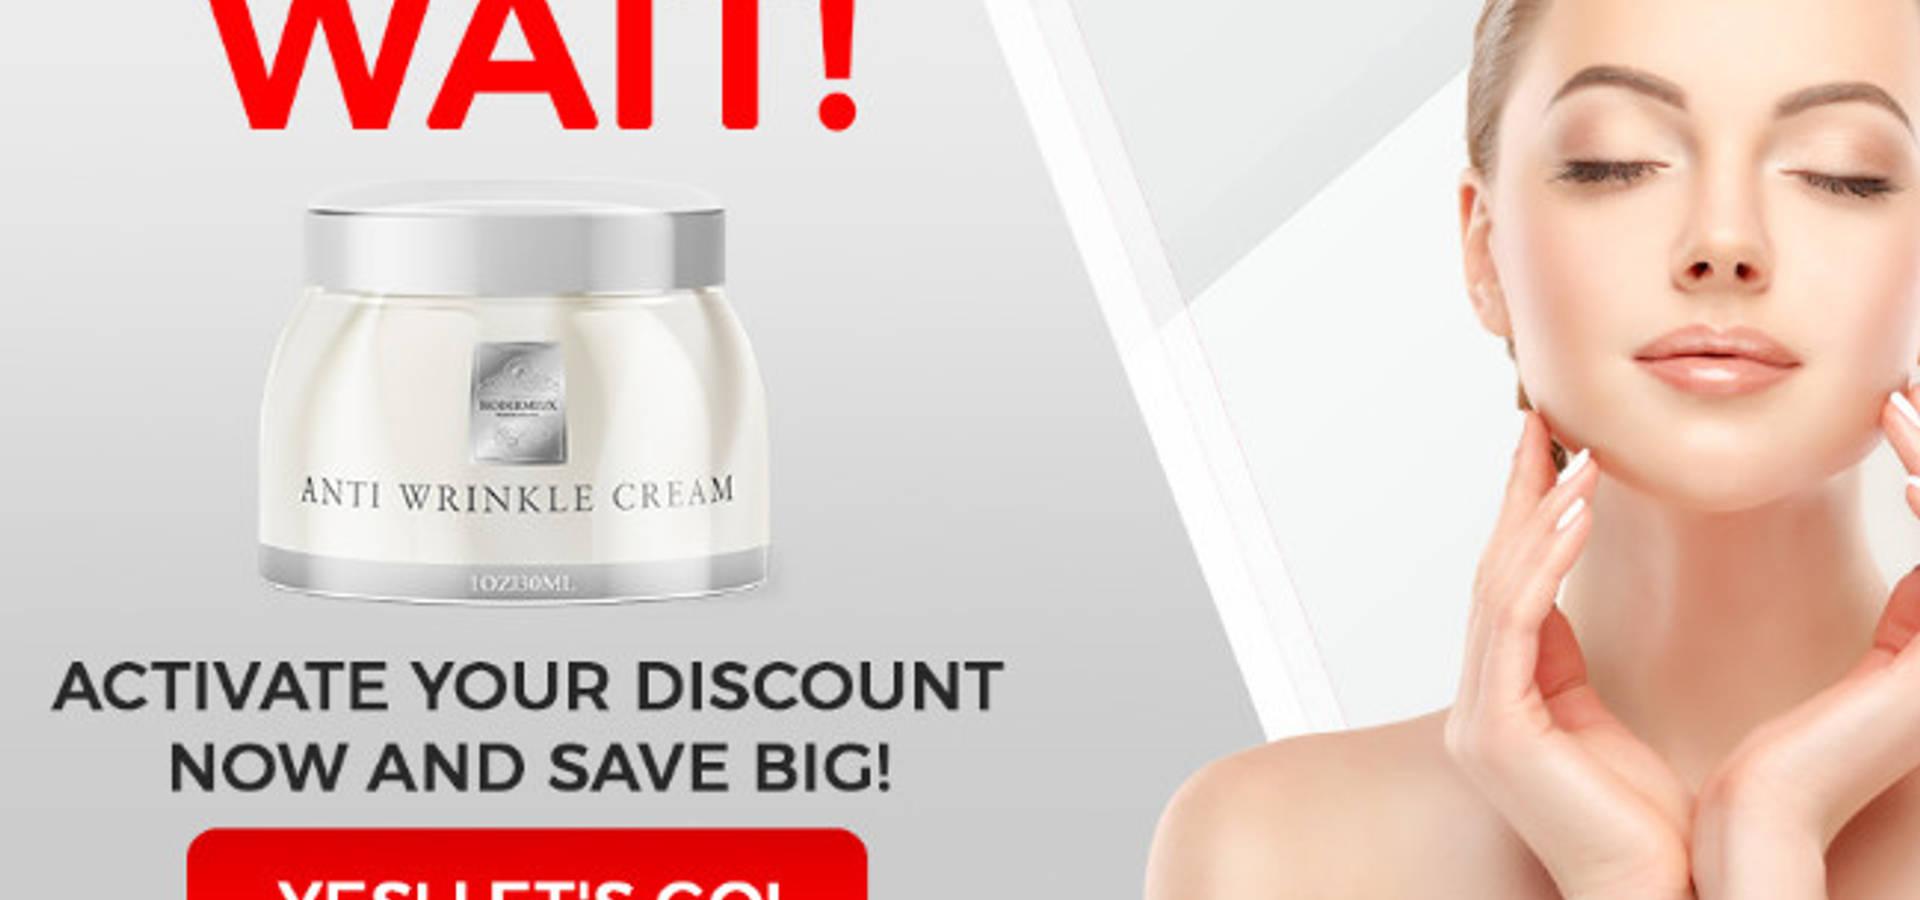 Biodermeux Skin Cream Official